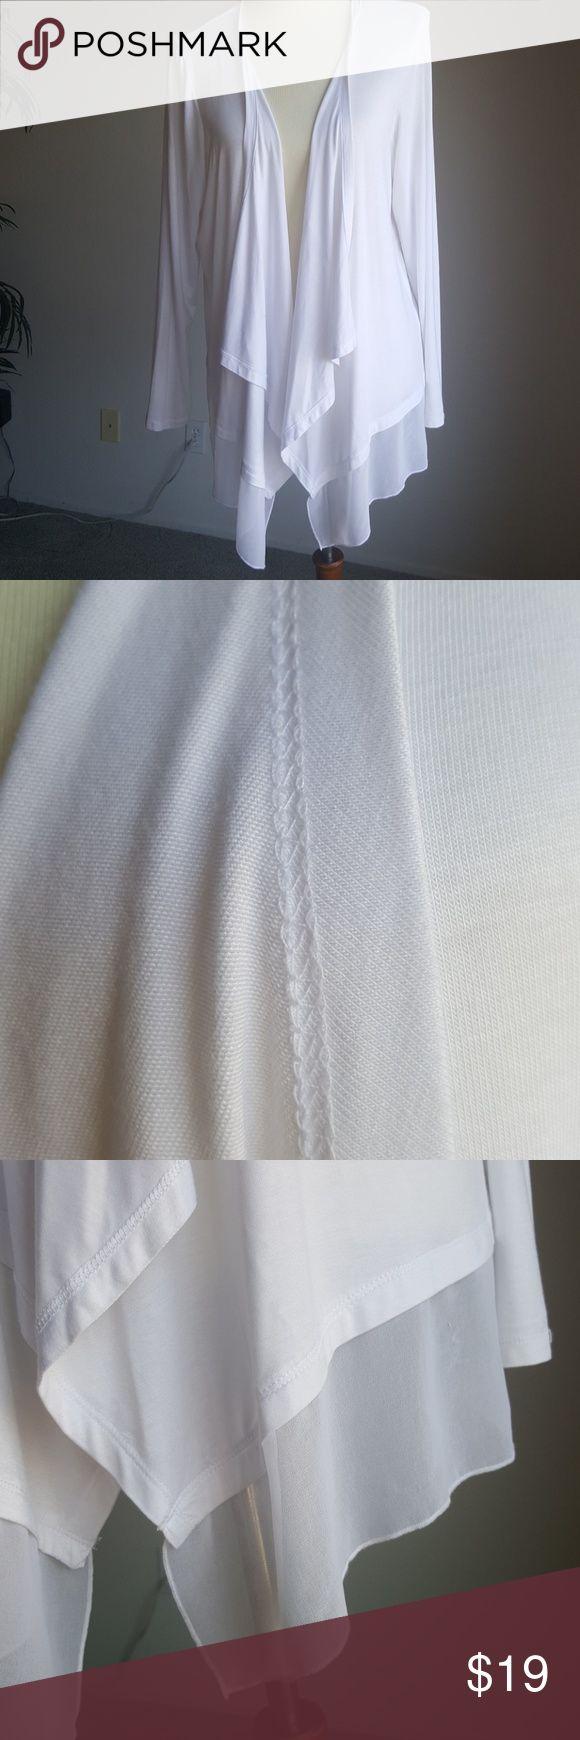 Dana Buchman larhe shrug White shrug for those cool summer evenings or a wonder wrap for a cold restaurant. Dana Buchman Sweaters Shrugs & Ponchos